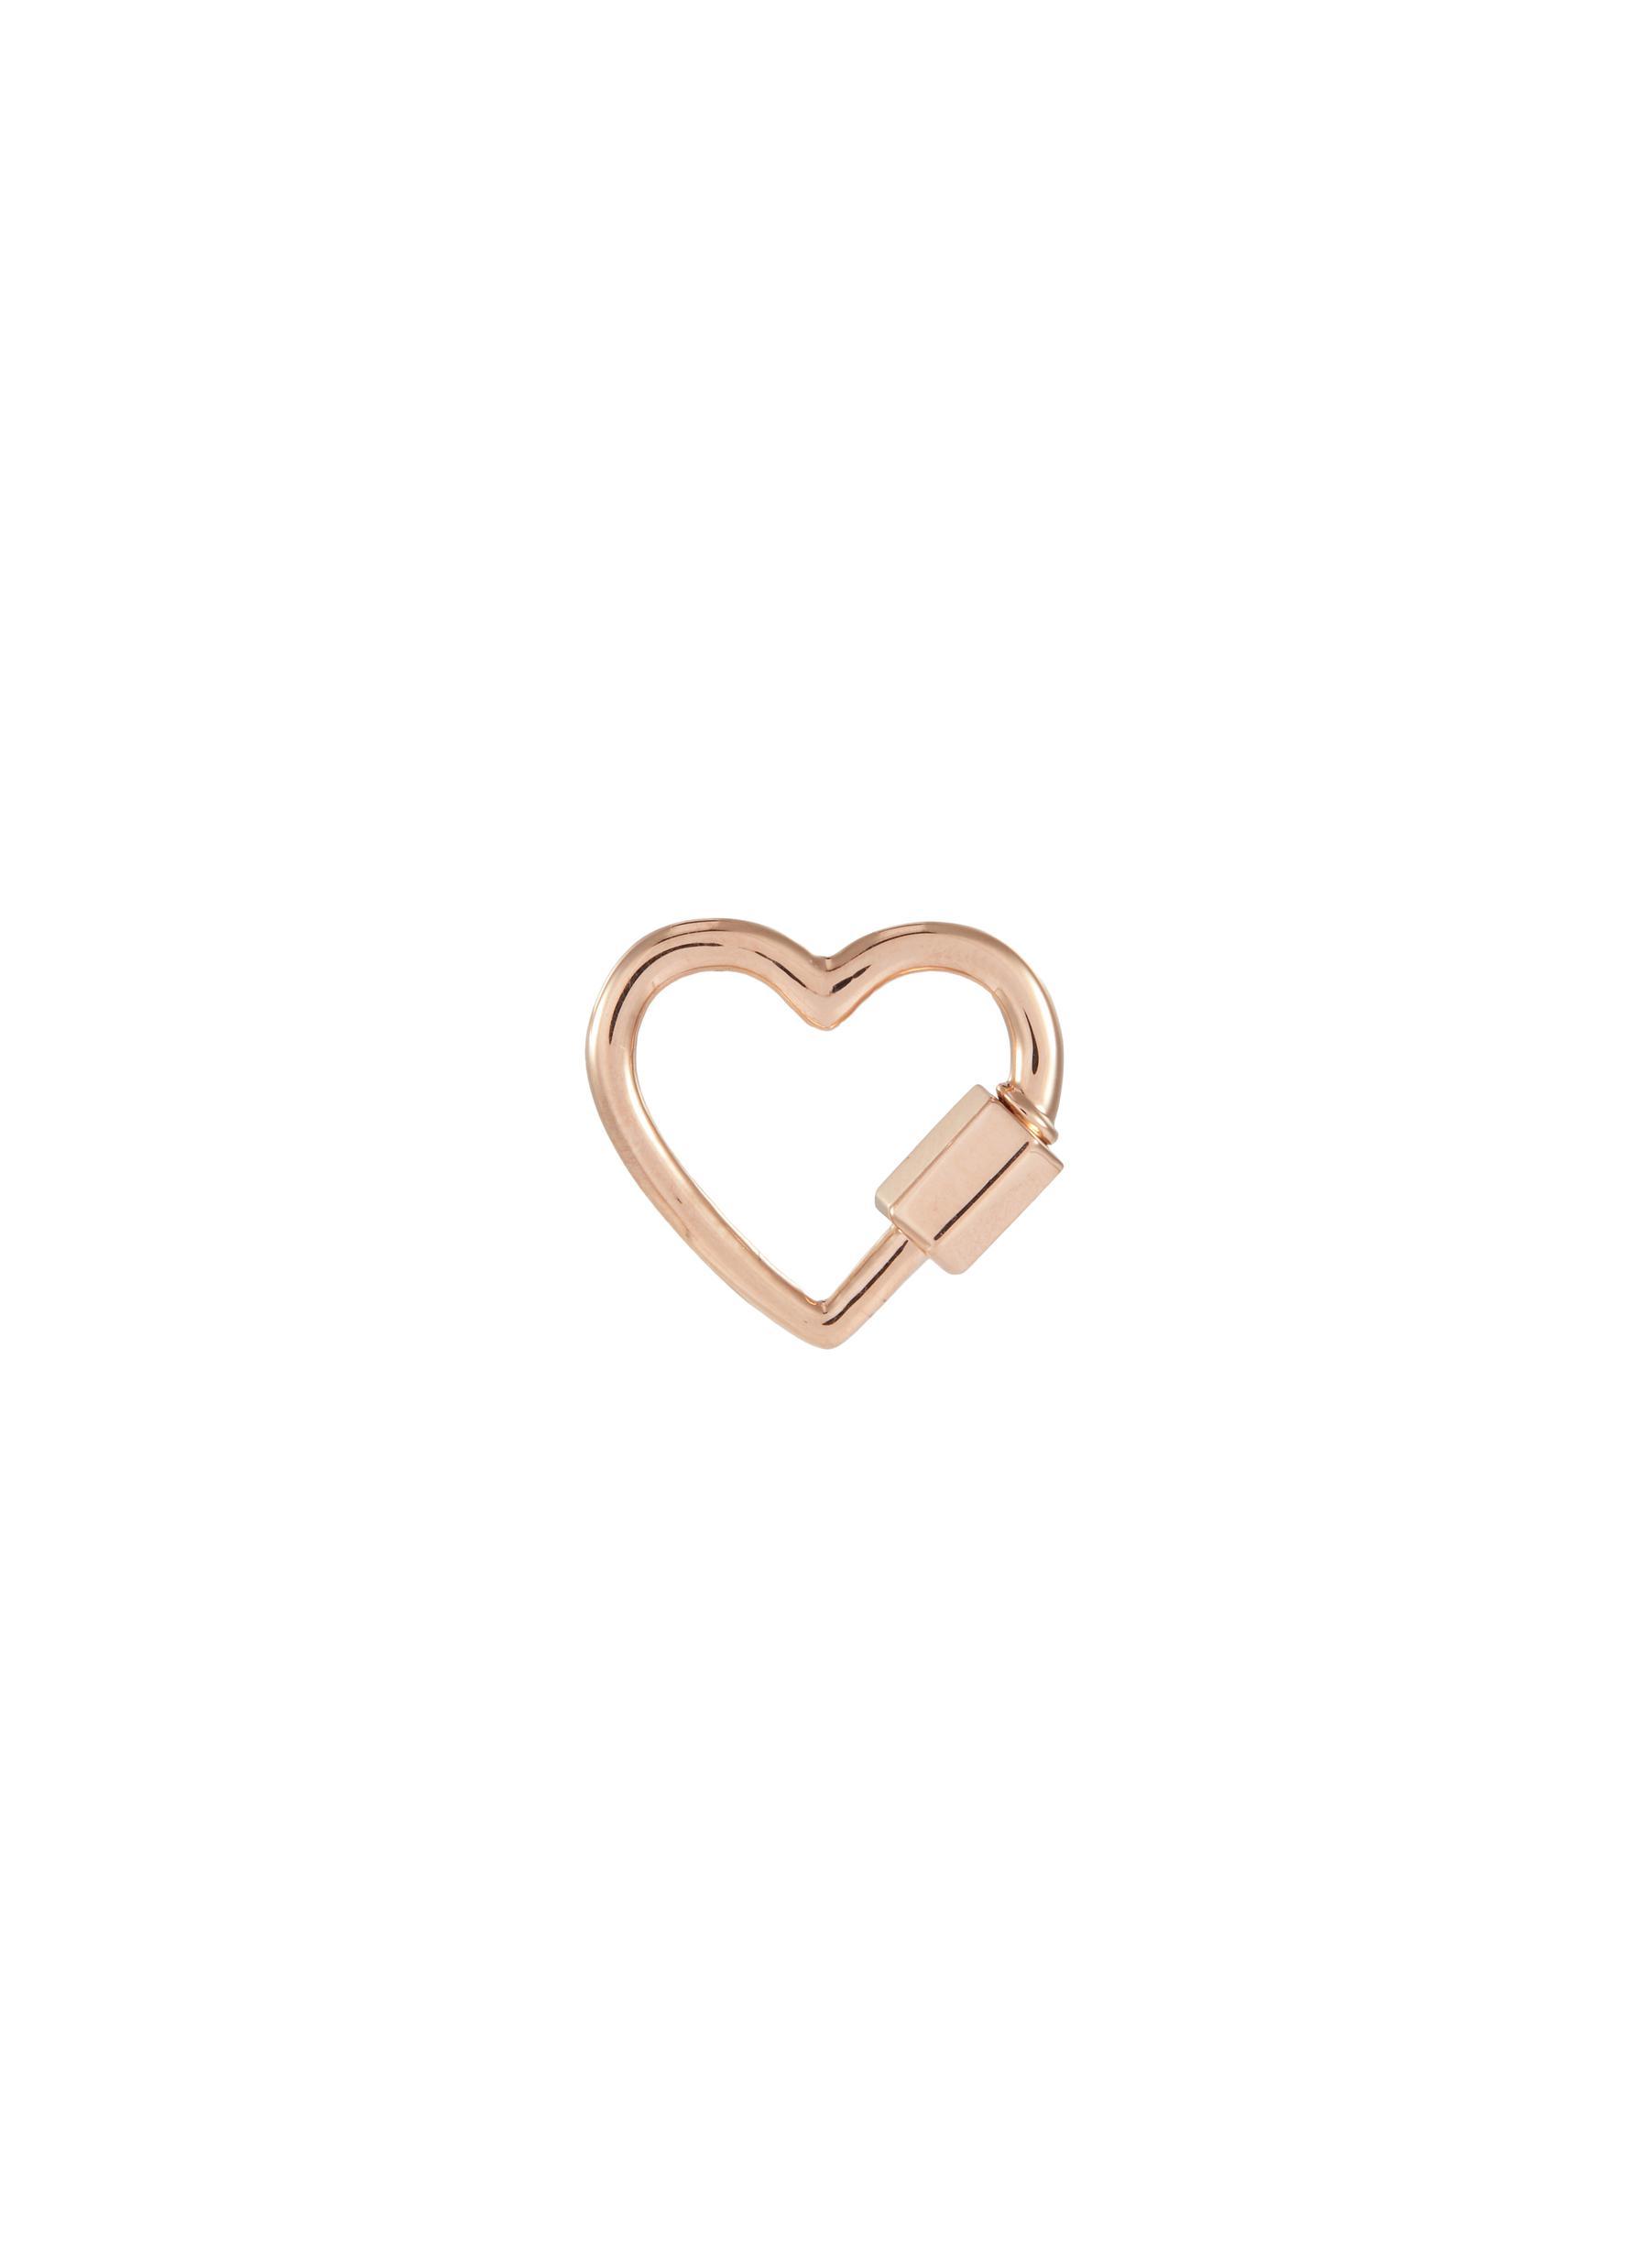 'Heart' 14k rose gold baby lock